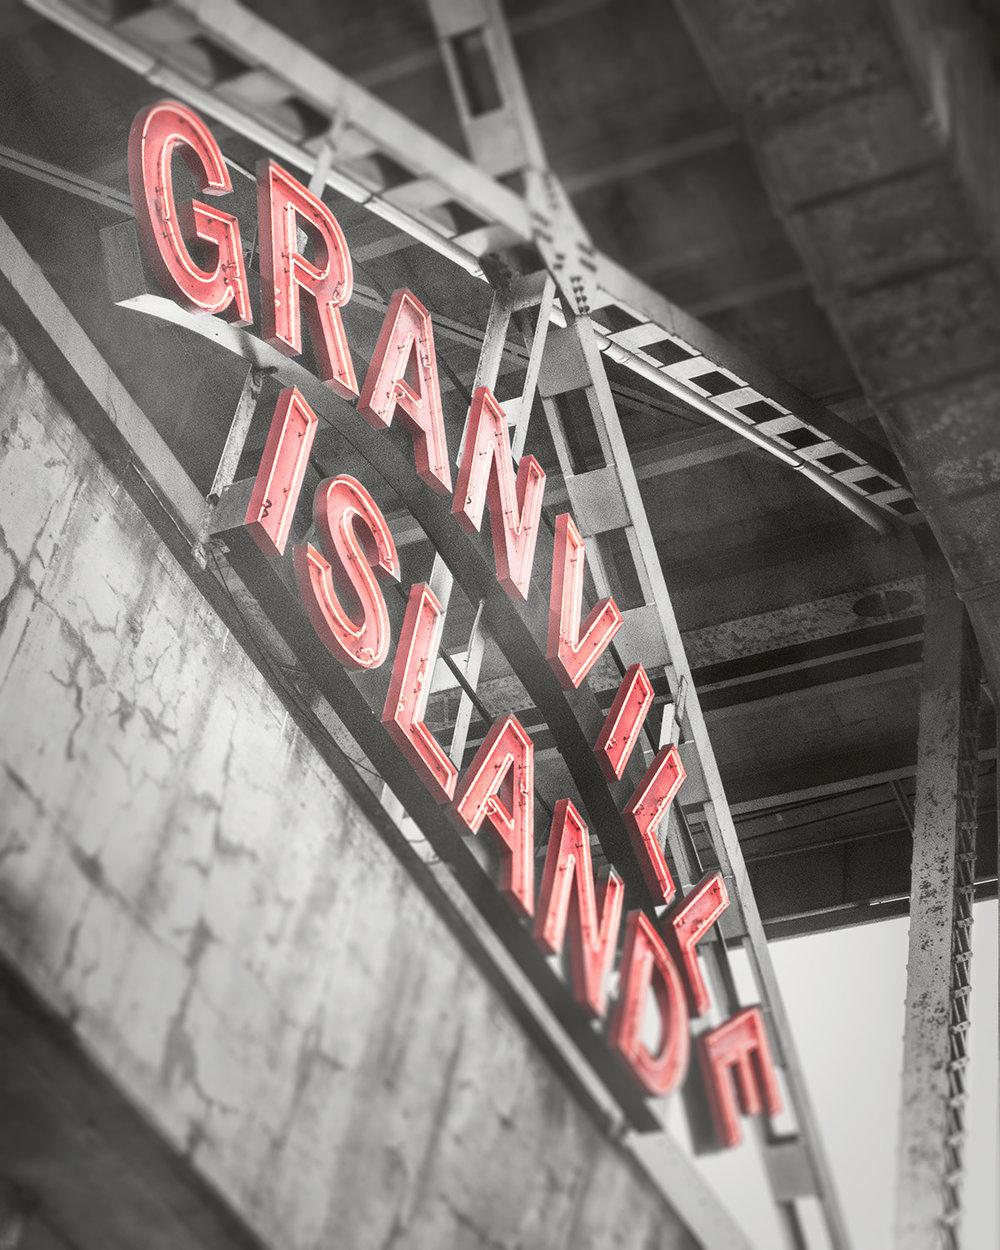 Raincity Series - Granville Island